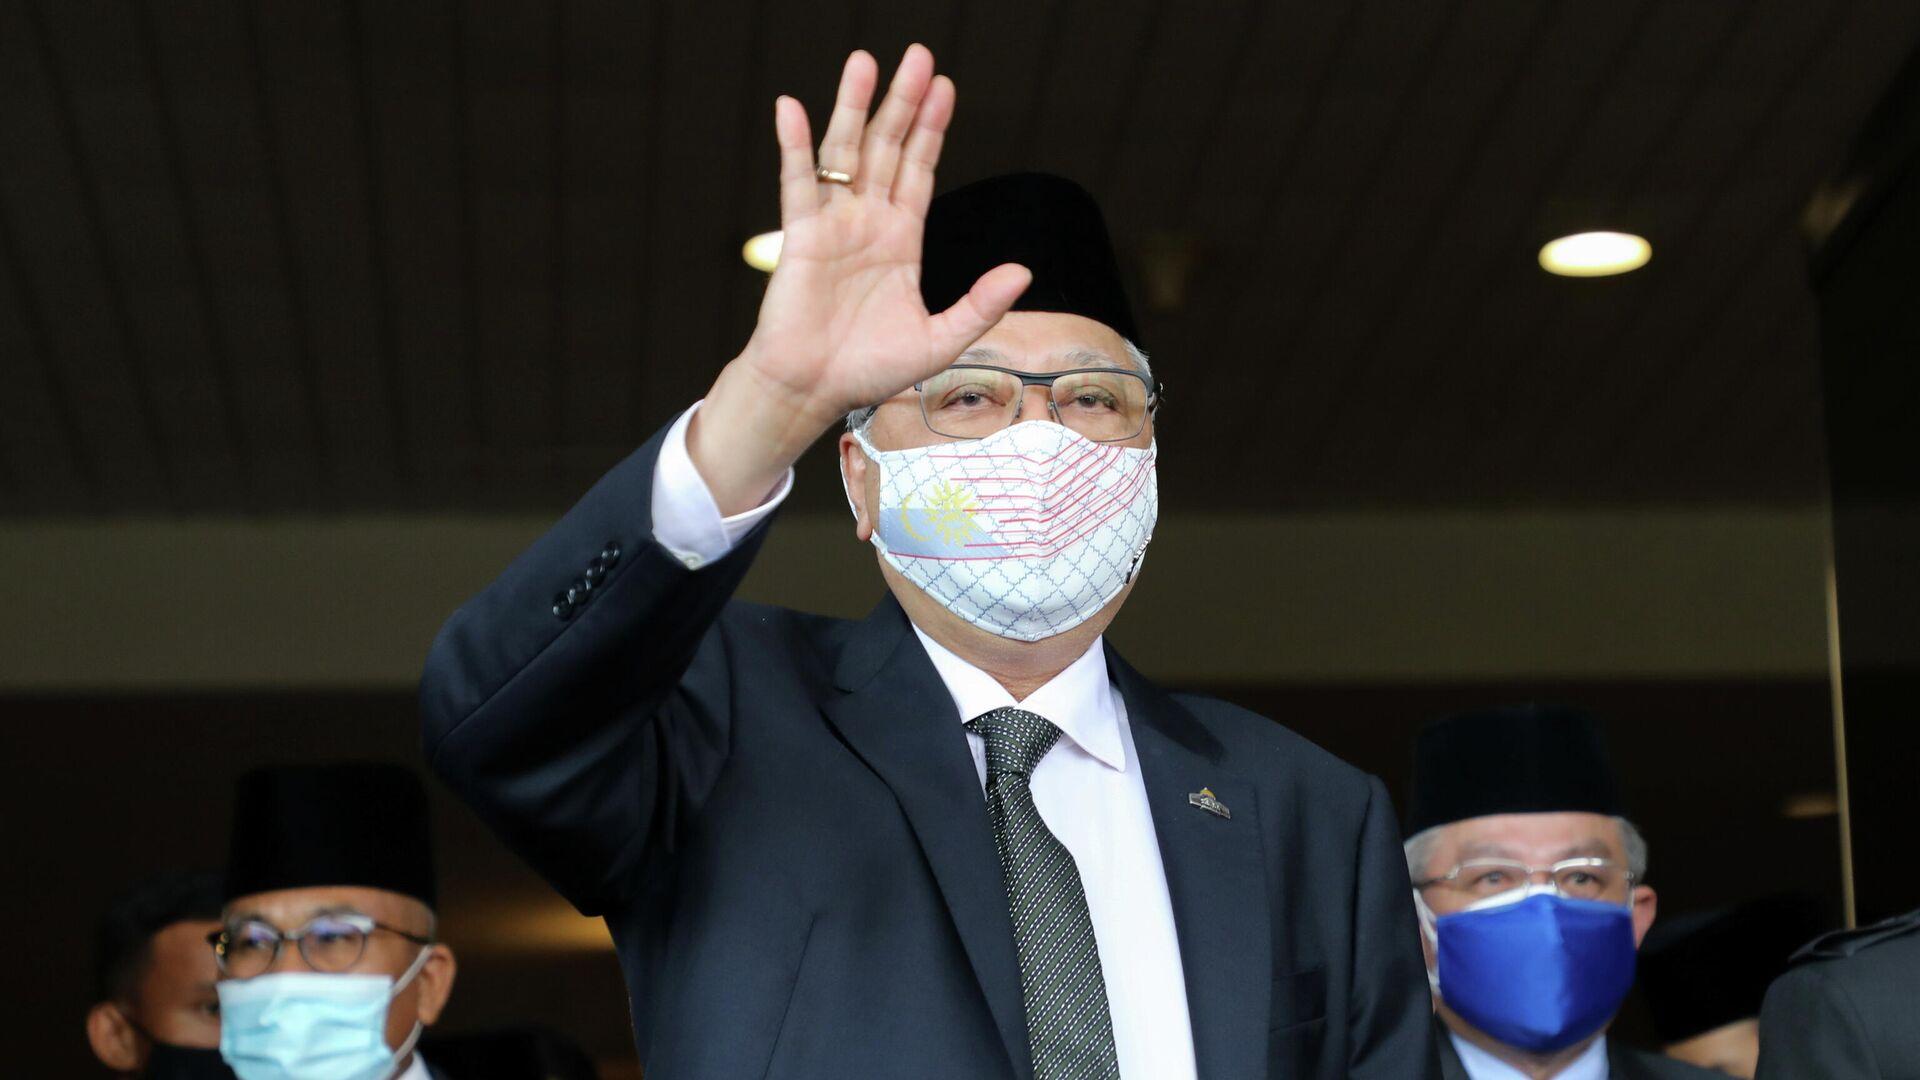 Ismail Sabri Yaakob, el primer ministro de Malasia - Sputnik Mundo, 1920, 20.08.2021